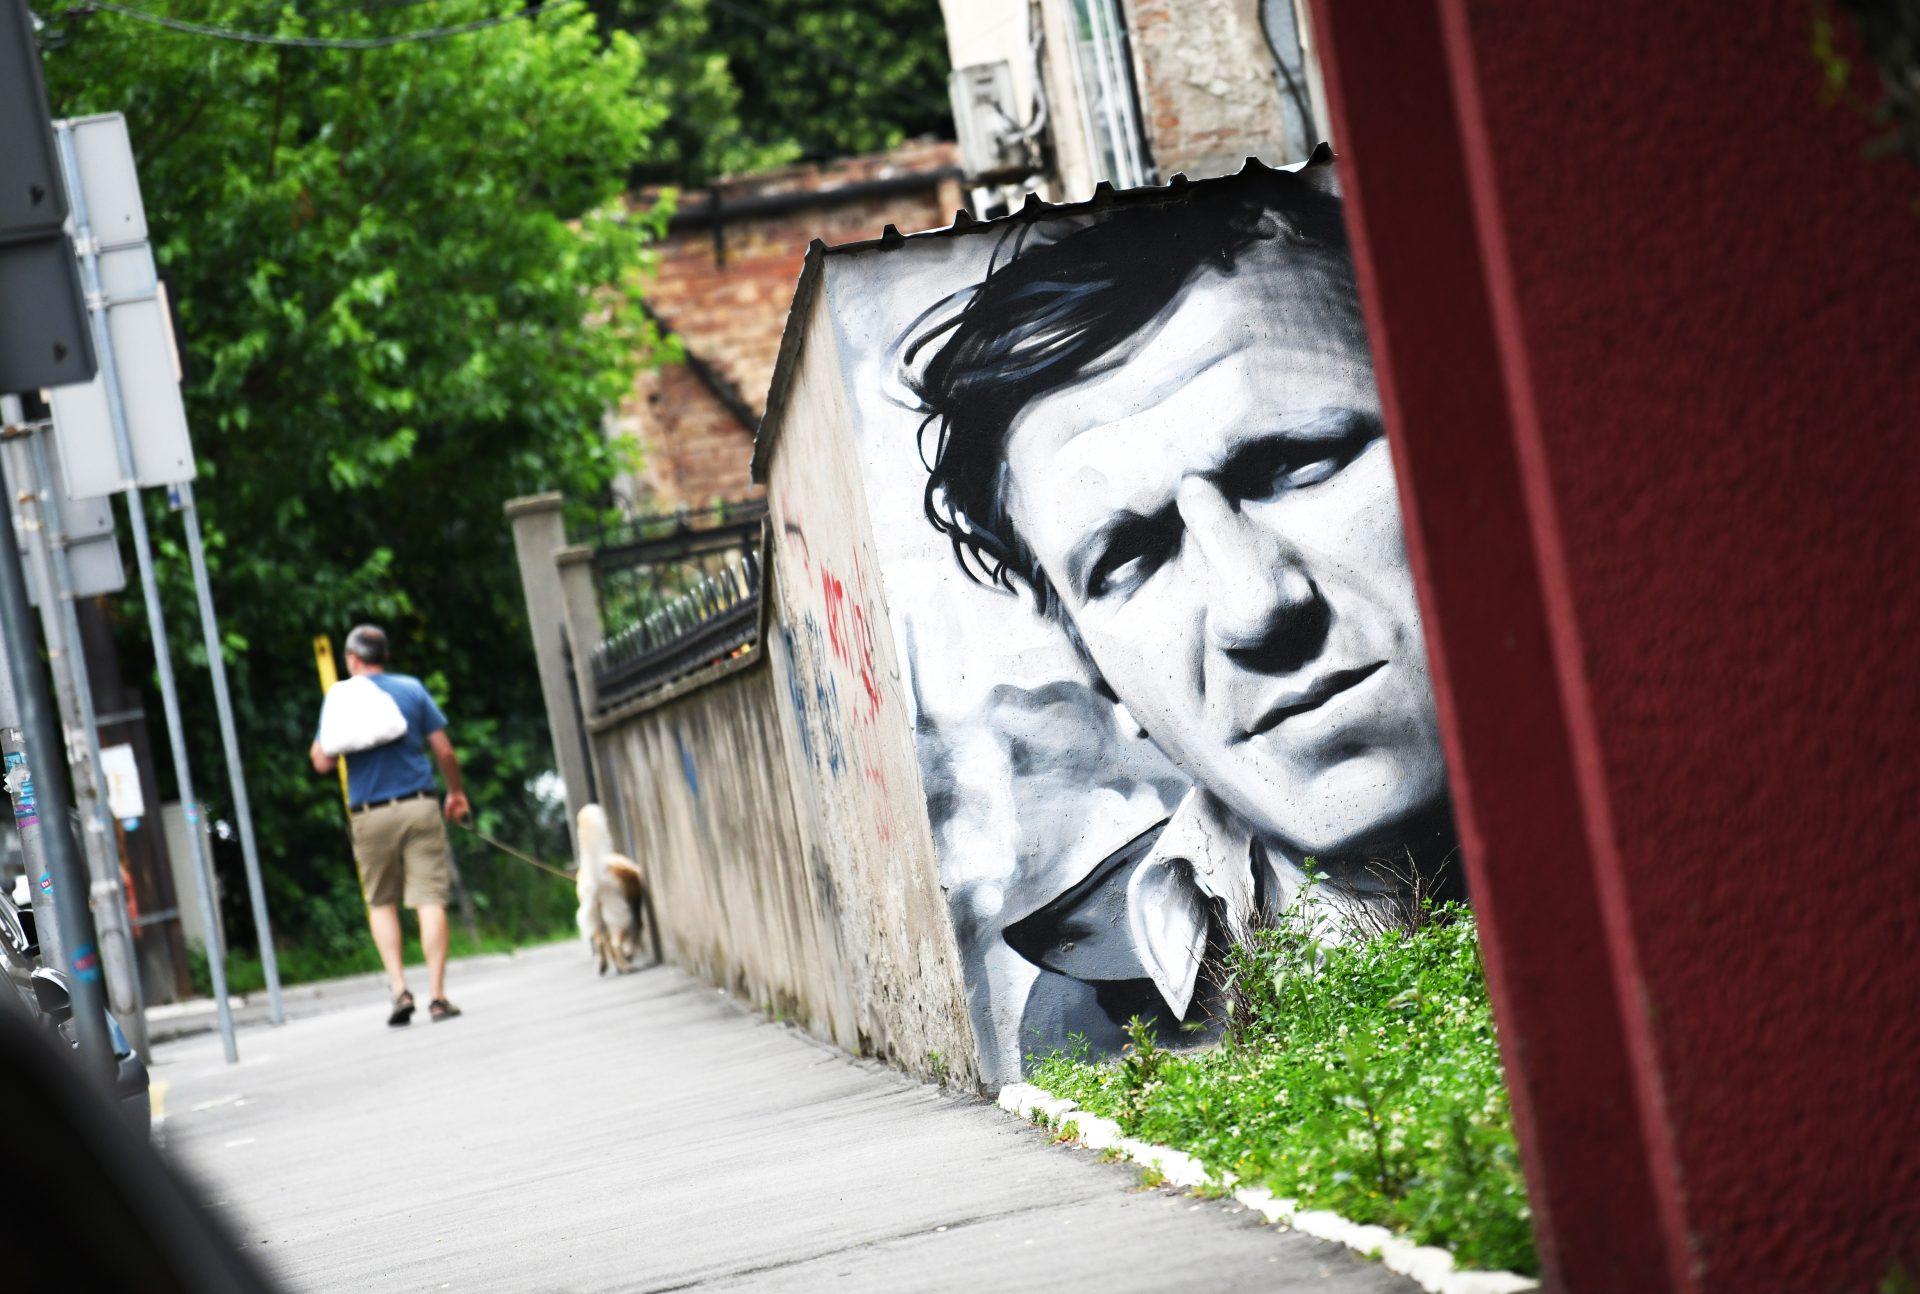 Nijemci je zvjerski mučili i objesili, a Split je se srami. Danas je dobila mural - Page 2 Beograd_160620_foto-Vesna-Lalic-Nova.rs-56-1920x1294